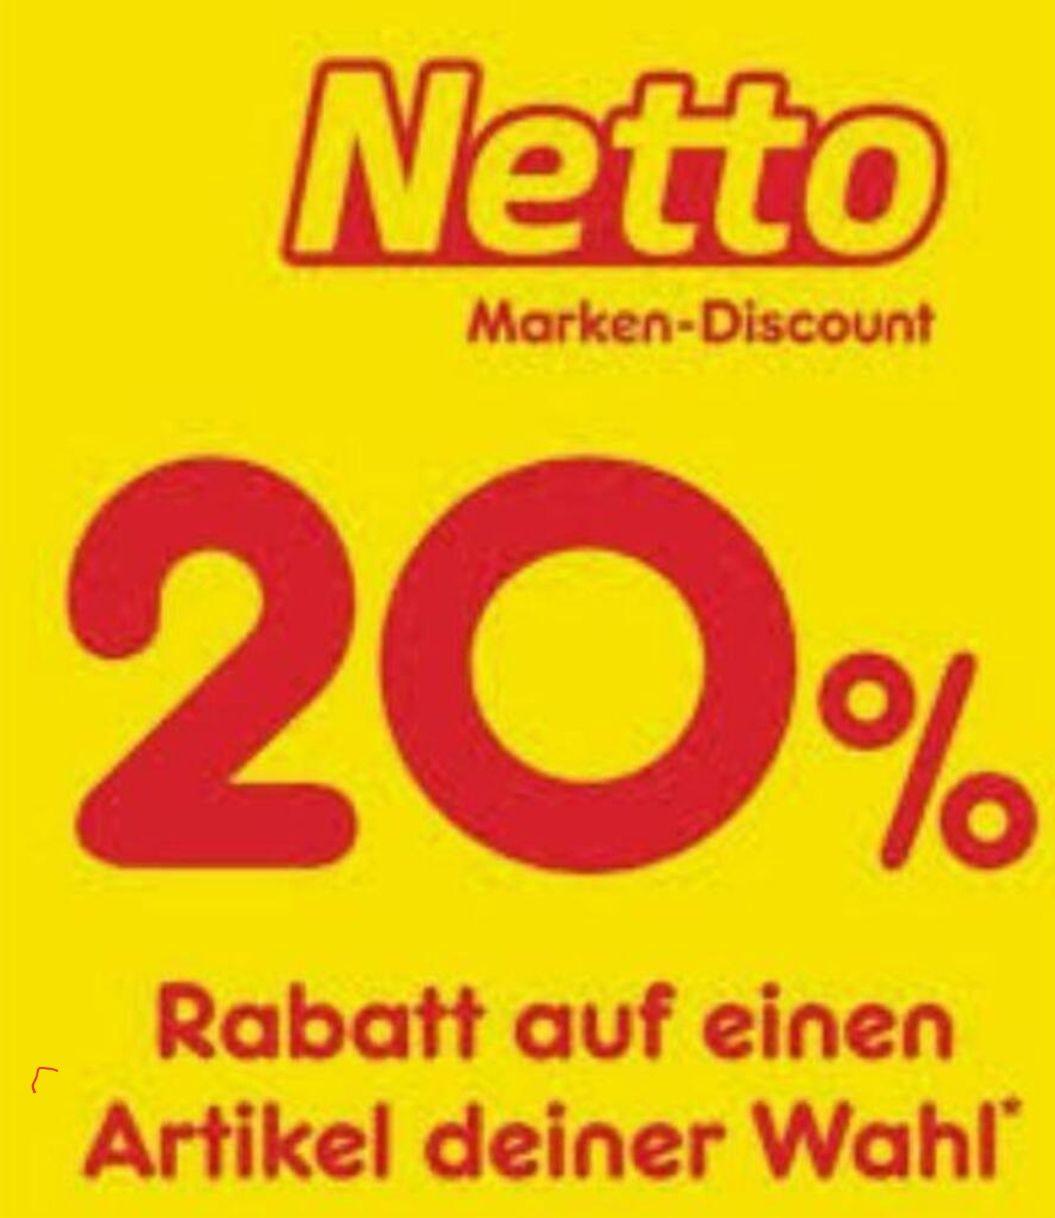 [Netto MD] Rabatt Coupons KW47 (16.11. - 21.11 ), bundesweit einsetzbar